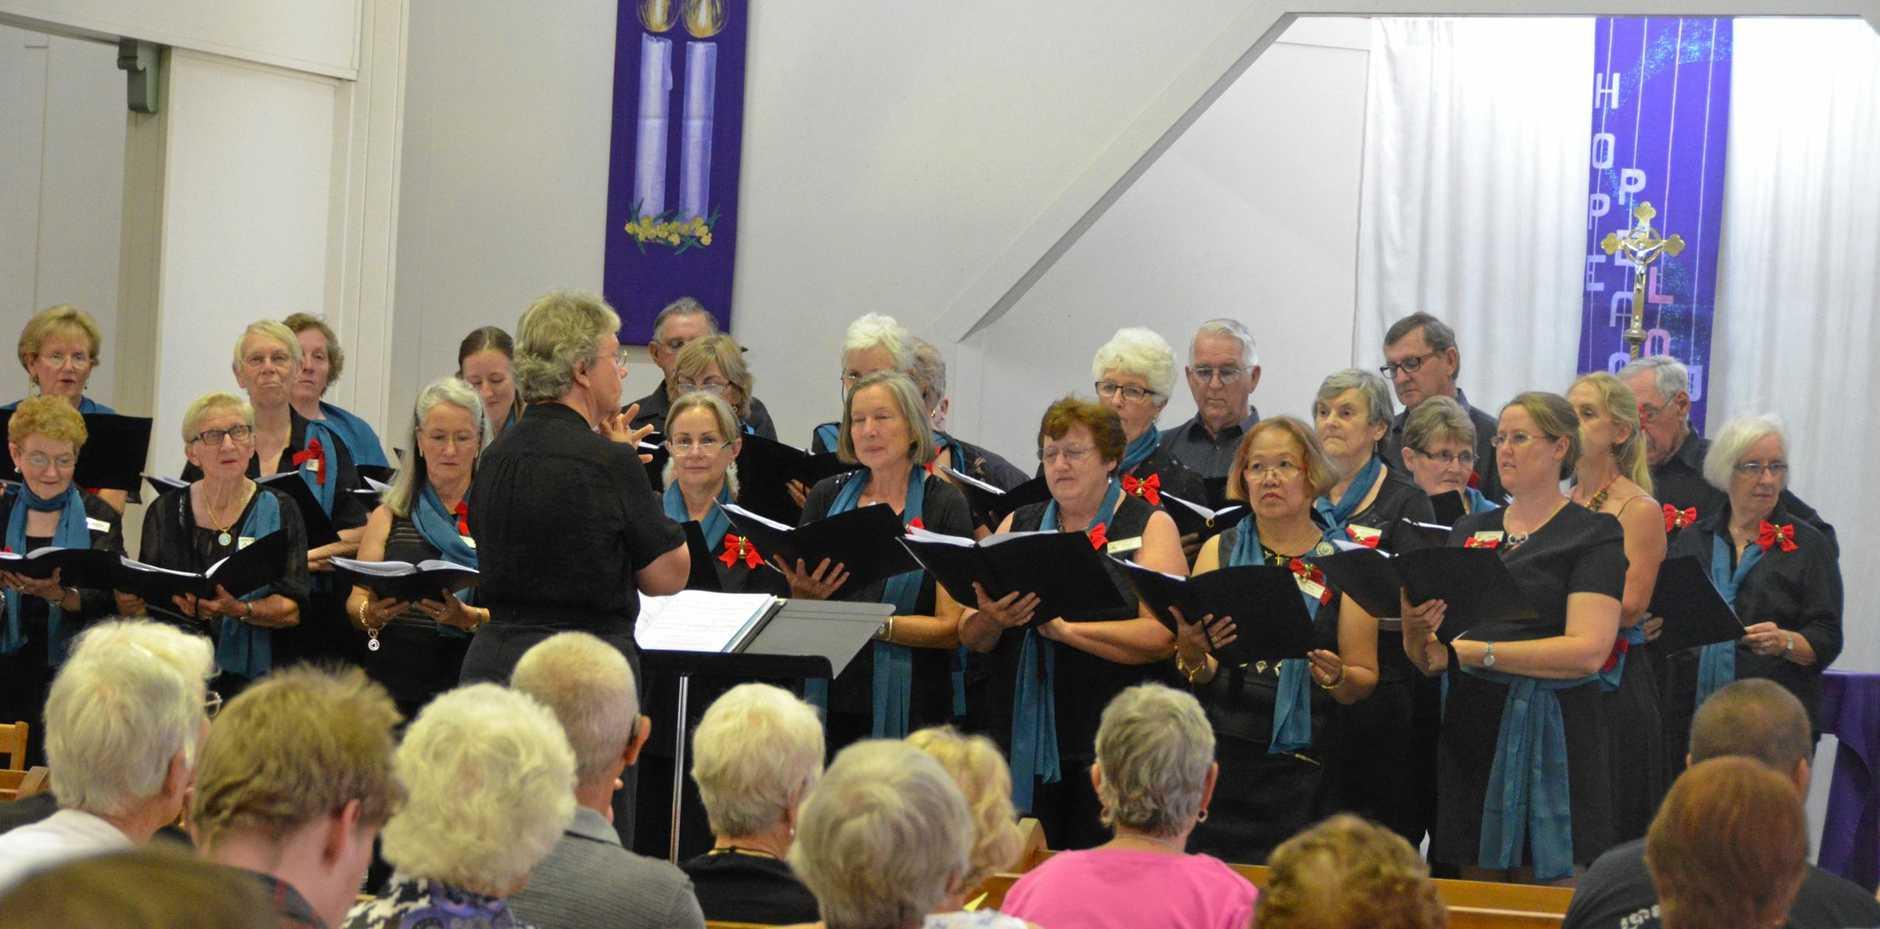 The South Burnett Chorale sang with harmonious voices.    Photo Keagan Elder / South Burnett Times